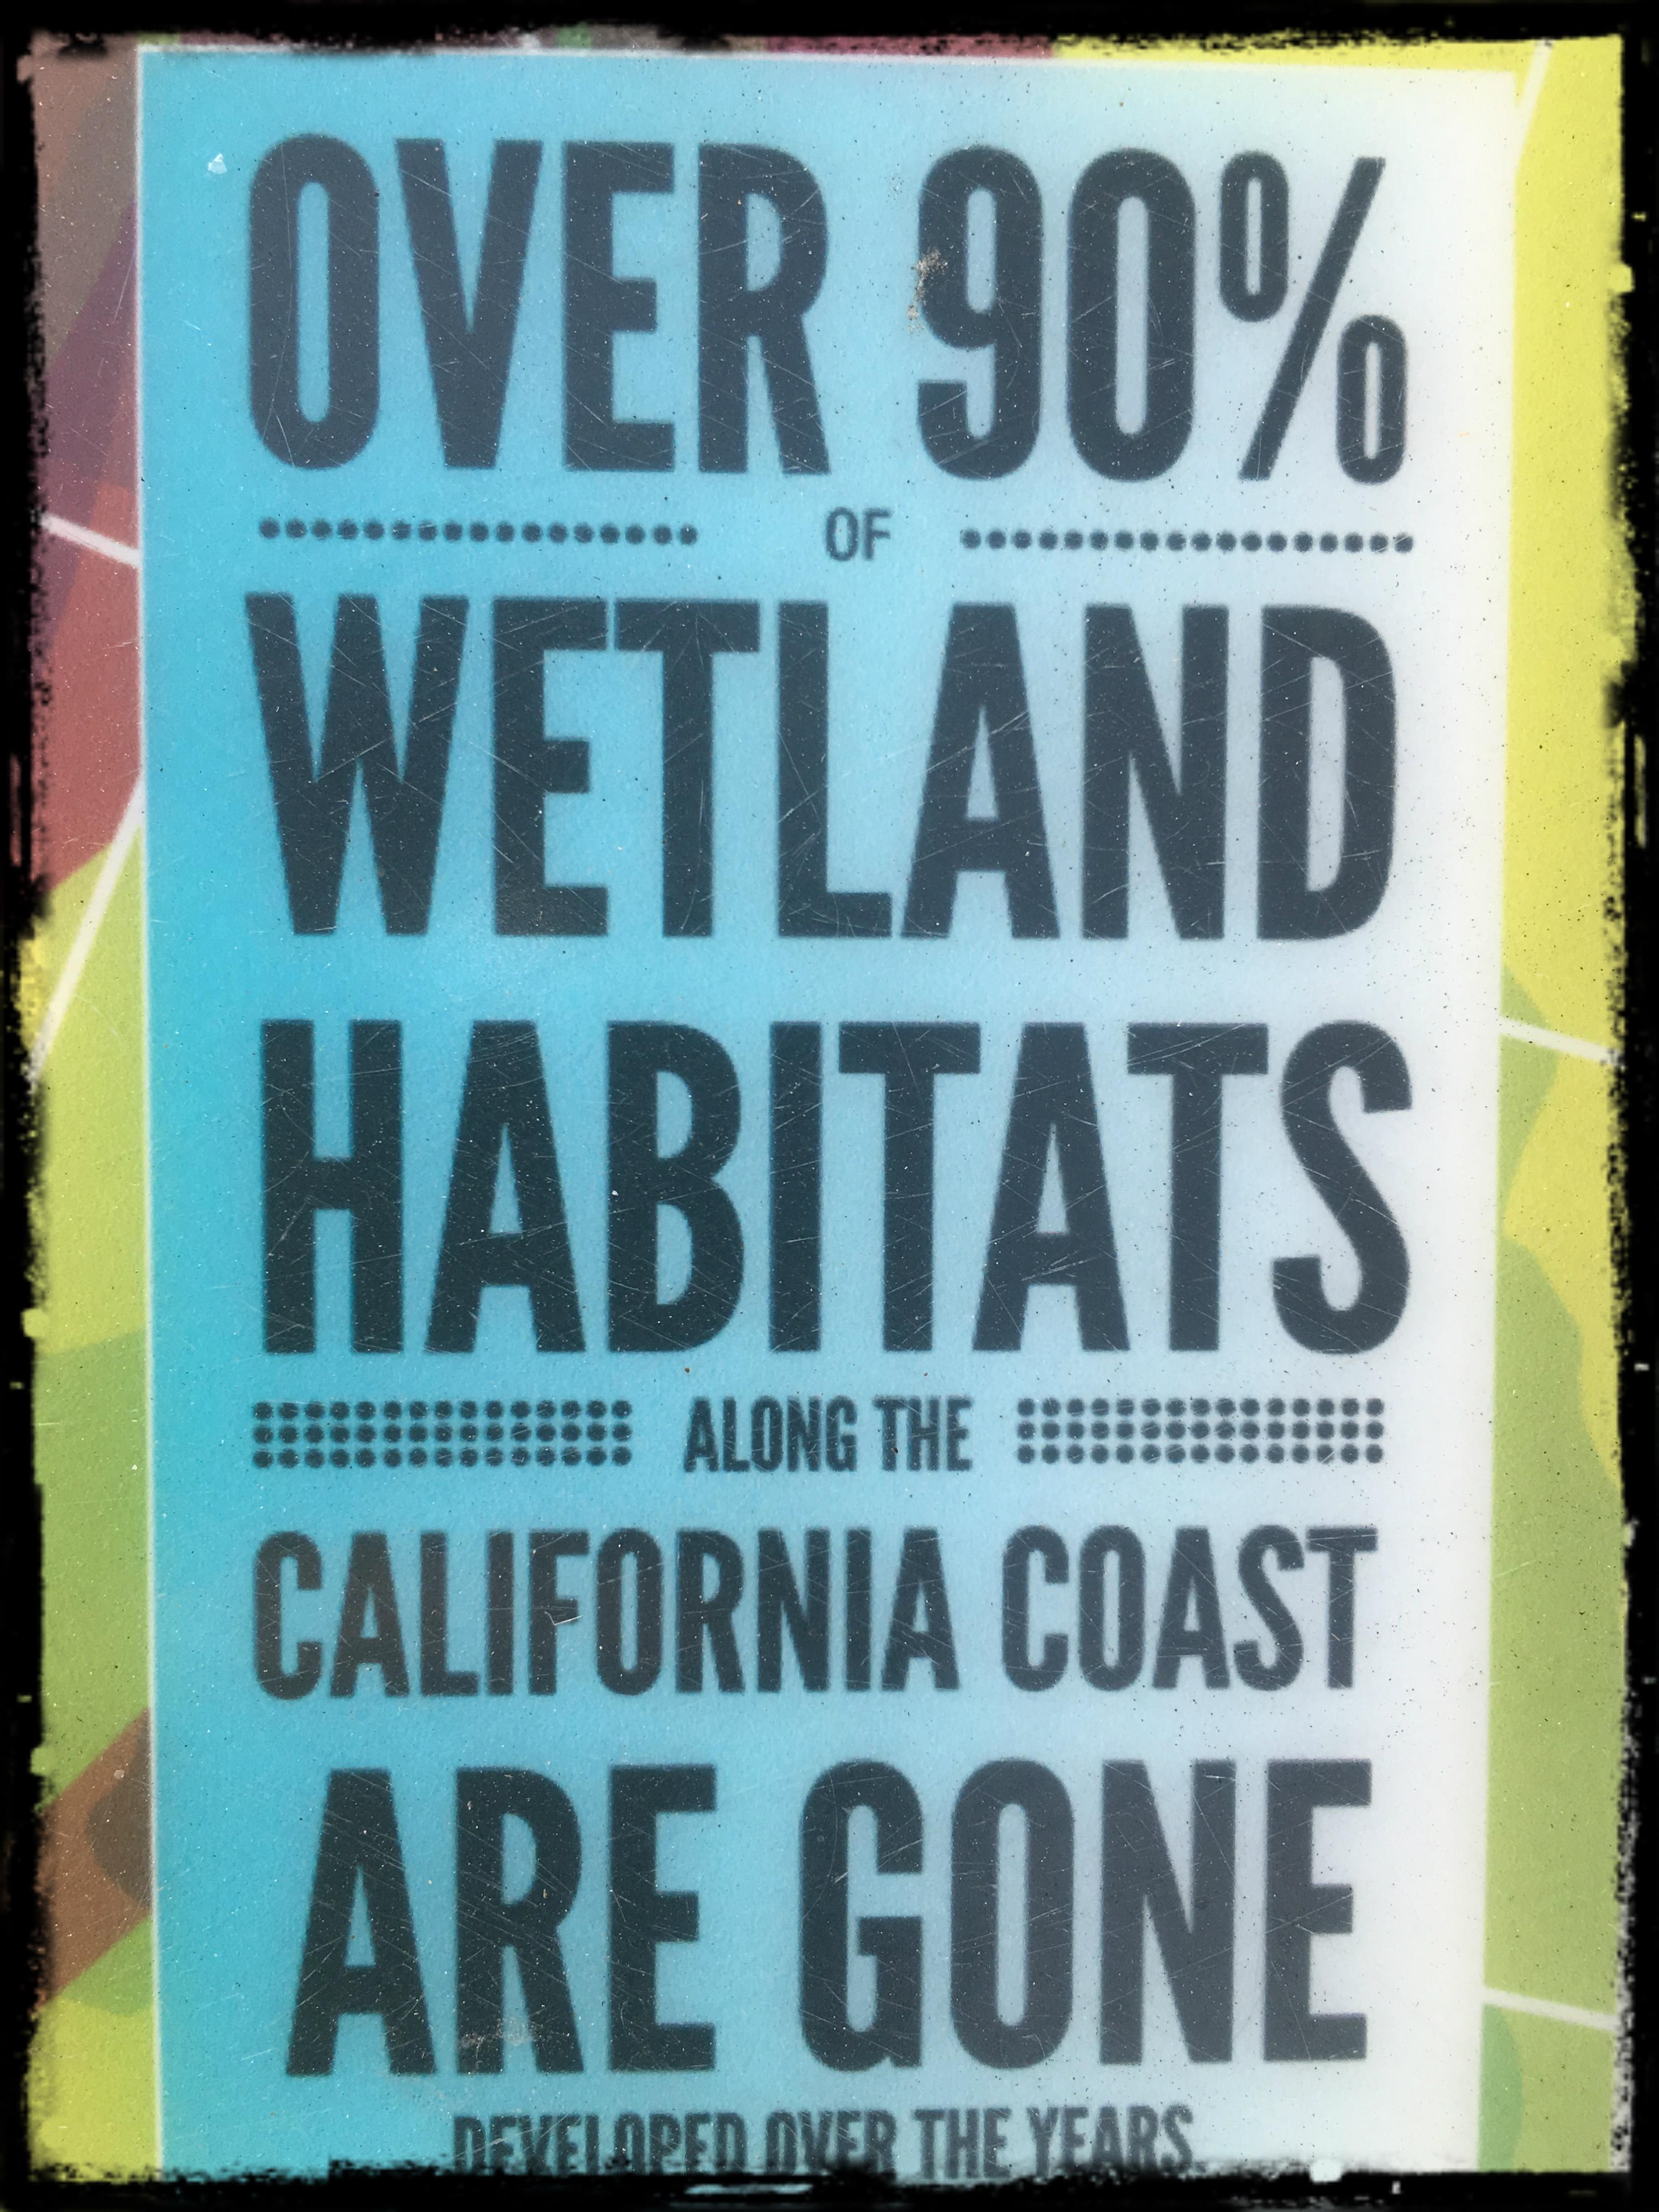 California Wetlands Habitat border